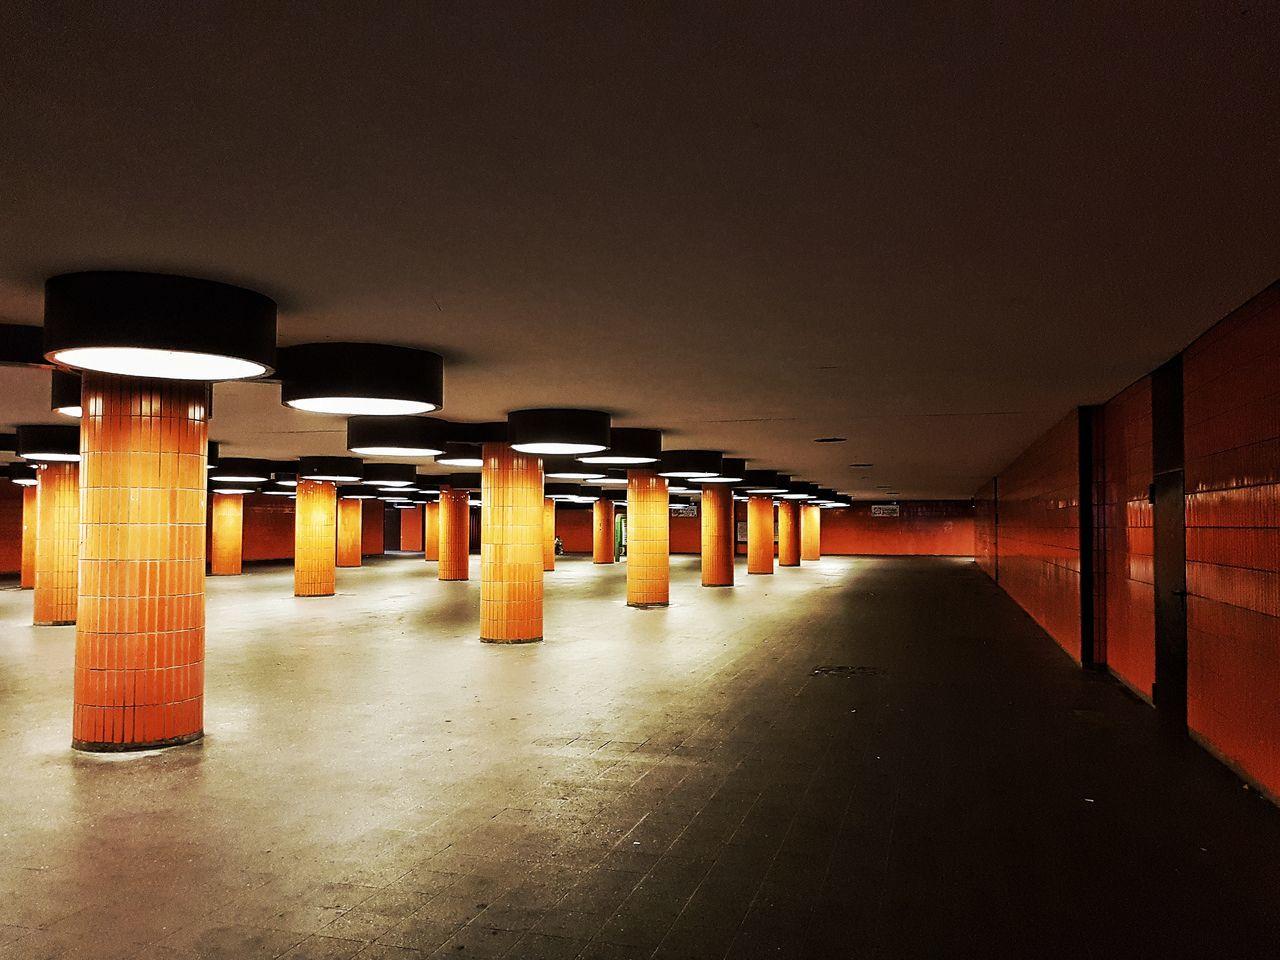 Architecture Illuminated Indoors  Underground Passage